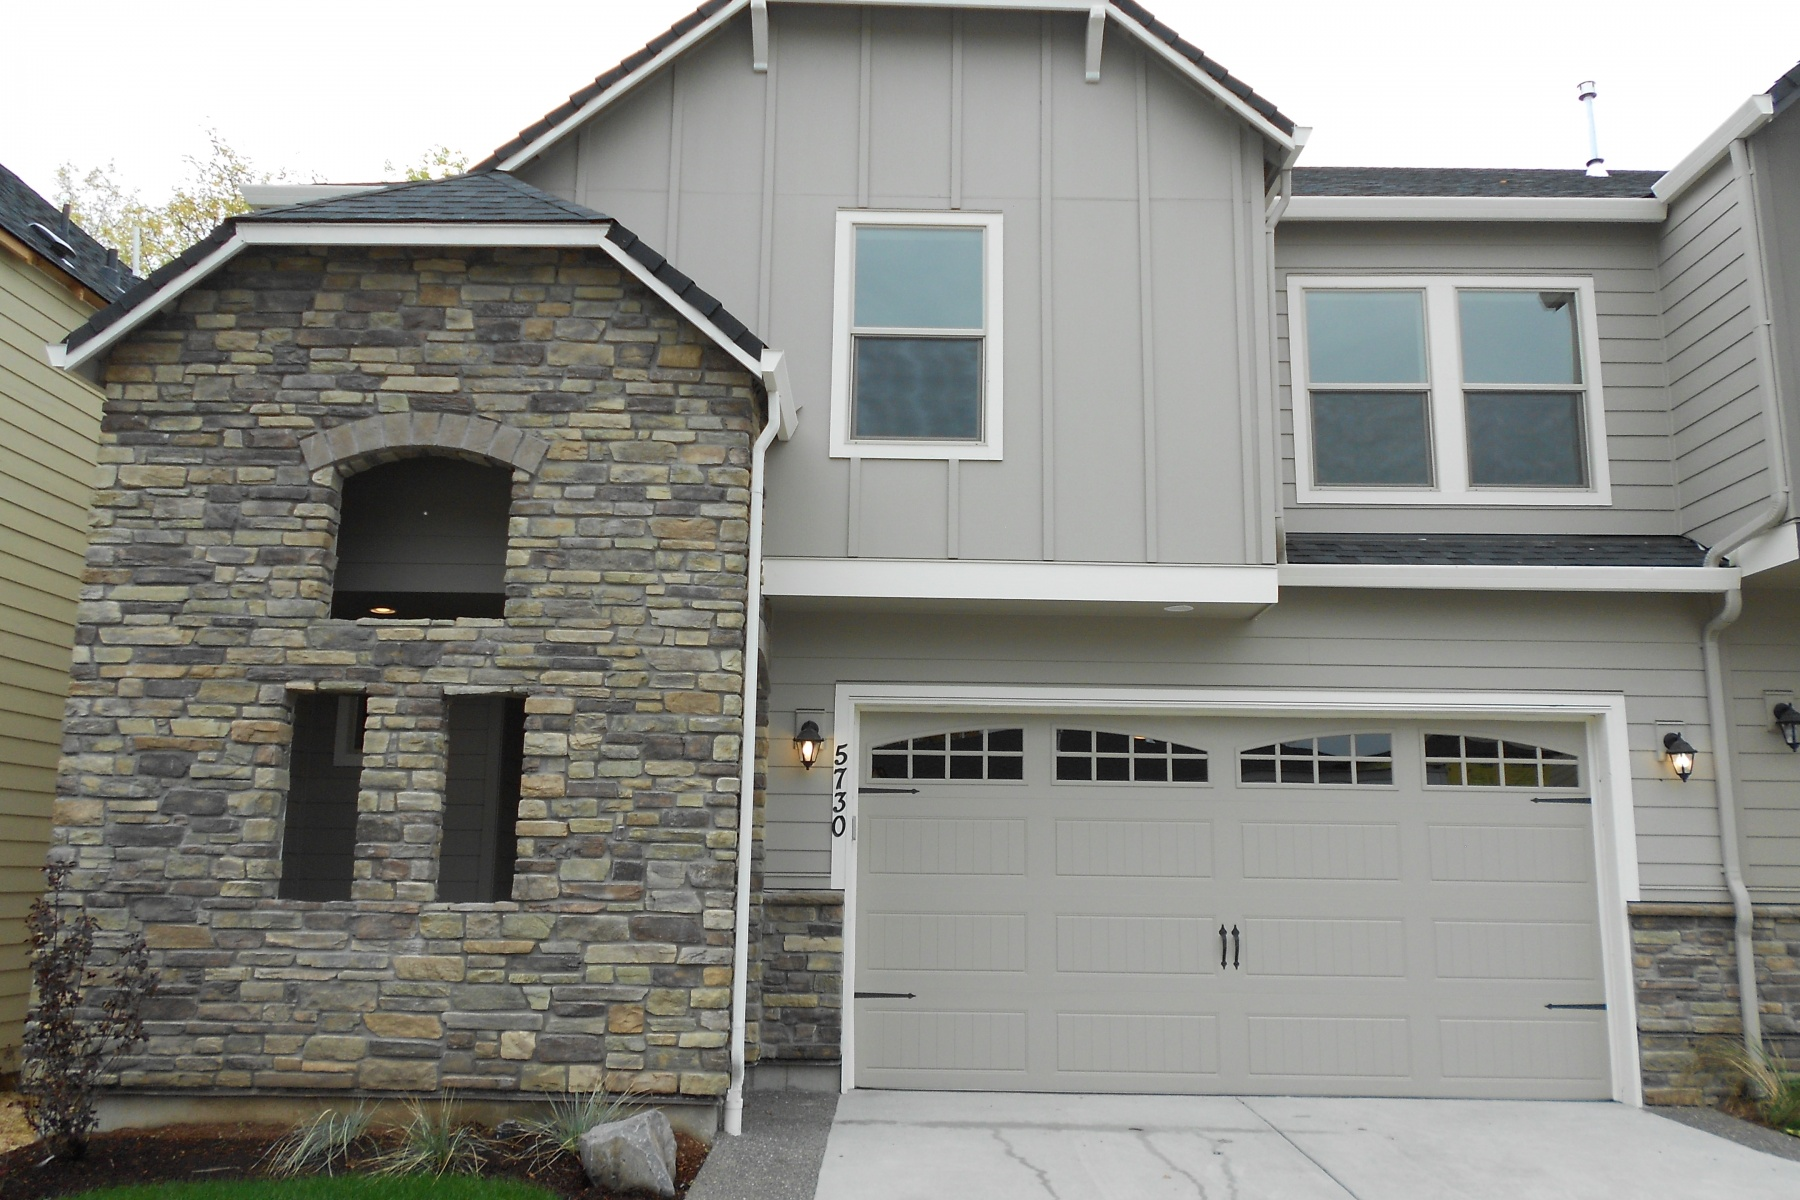 Single Family Home for Sale at 5730 NW 26th Ave , Camas, WA 98607 Camas, Washington 98607 United States